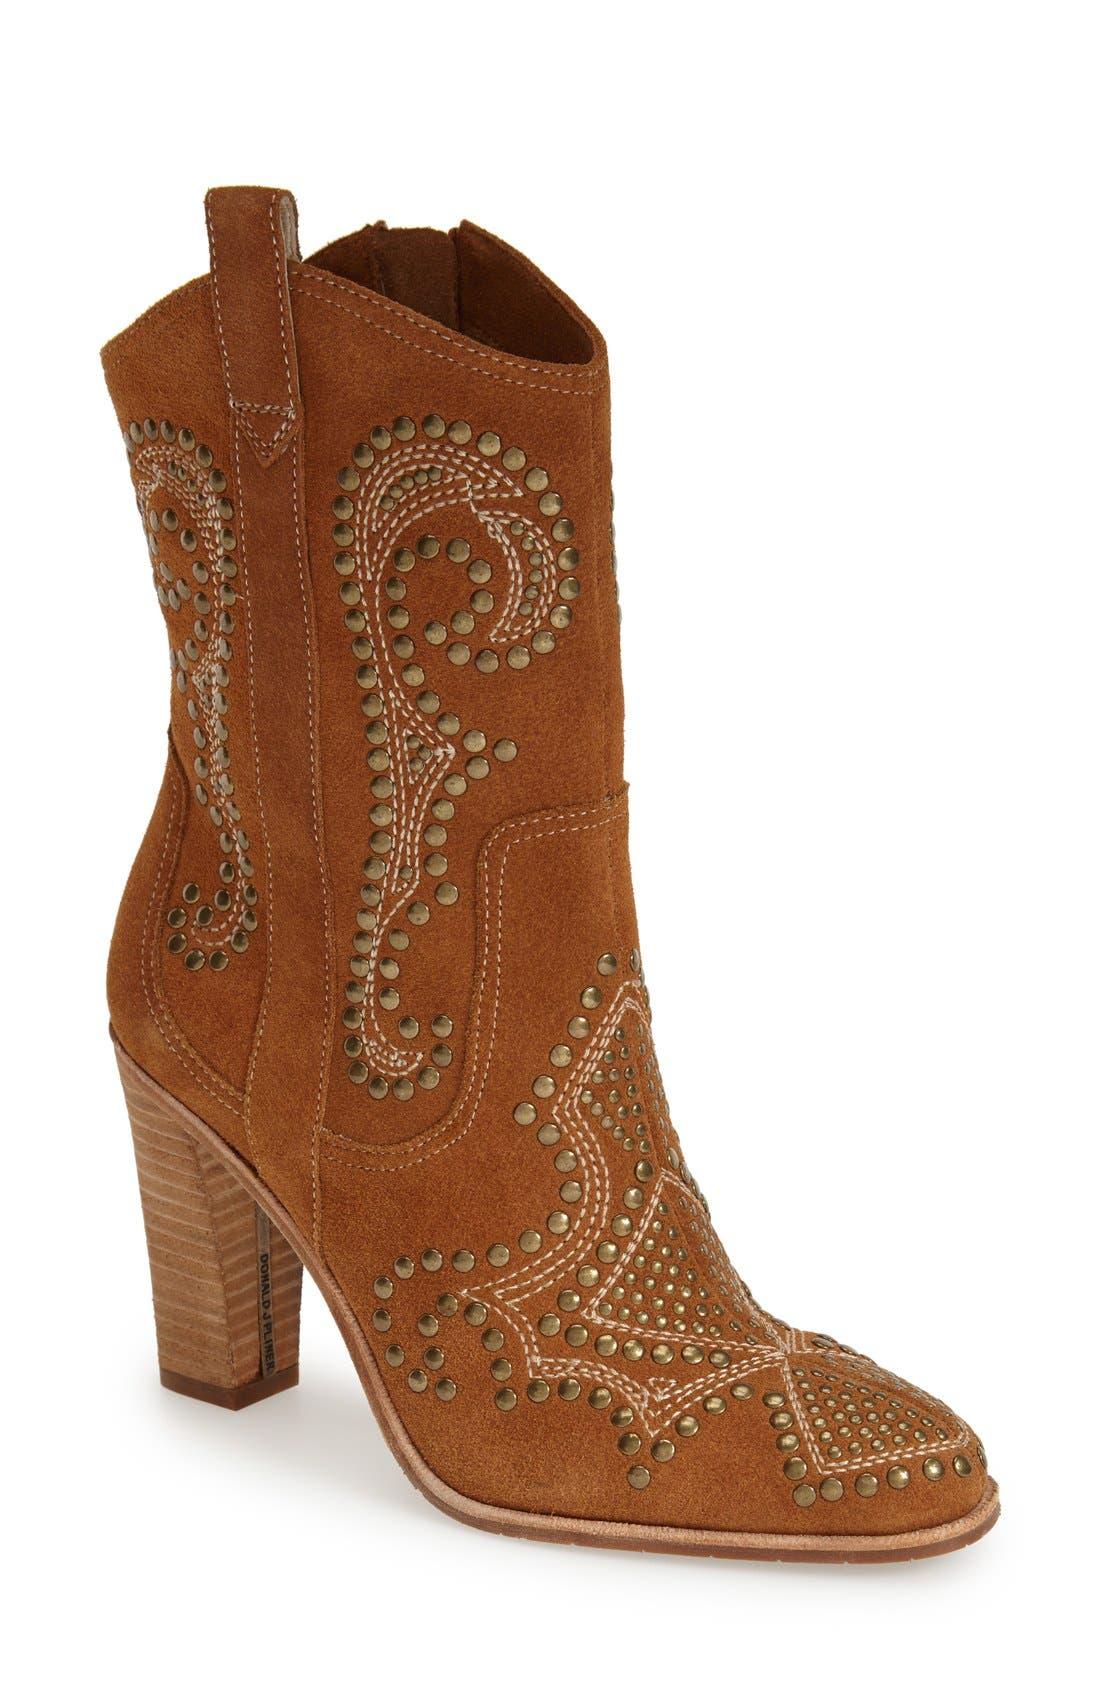 Alternate Image 1 Selected - Donald J Pliner 'Olivia' Western Boot (Women)